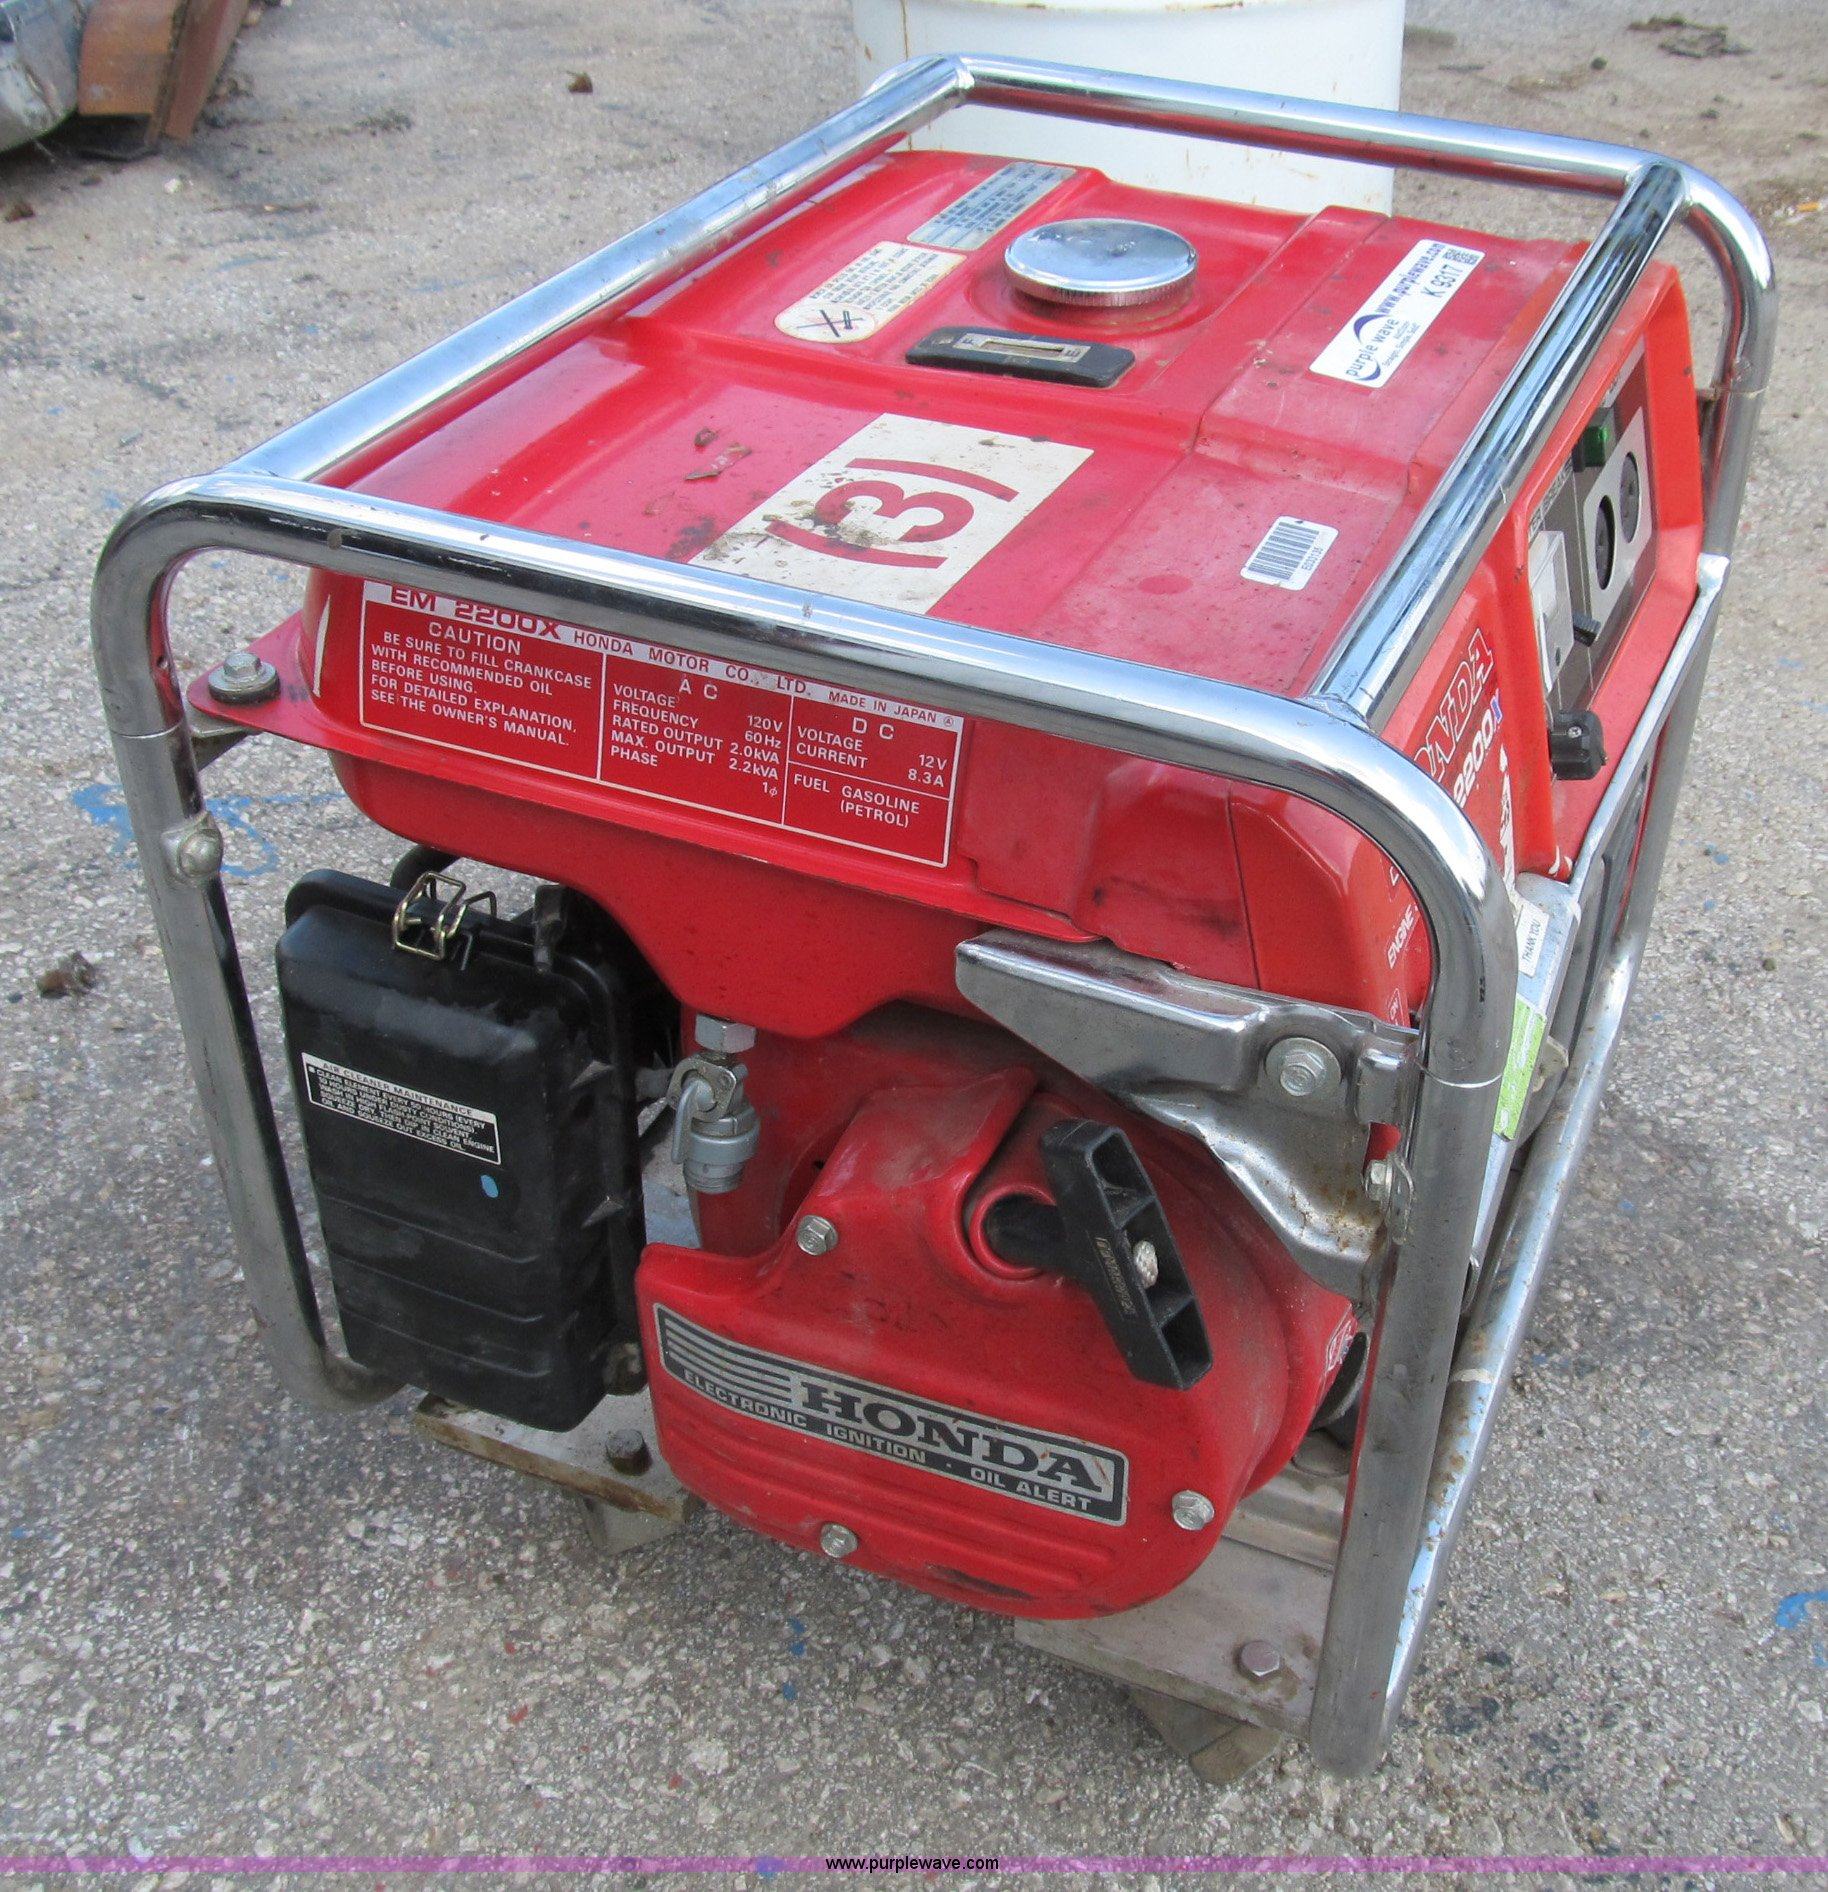 Honda EM2200X portable generator Item K9317